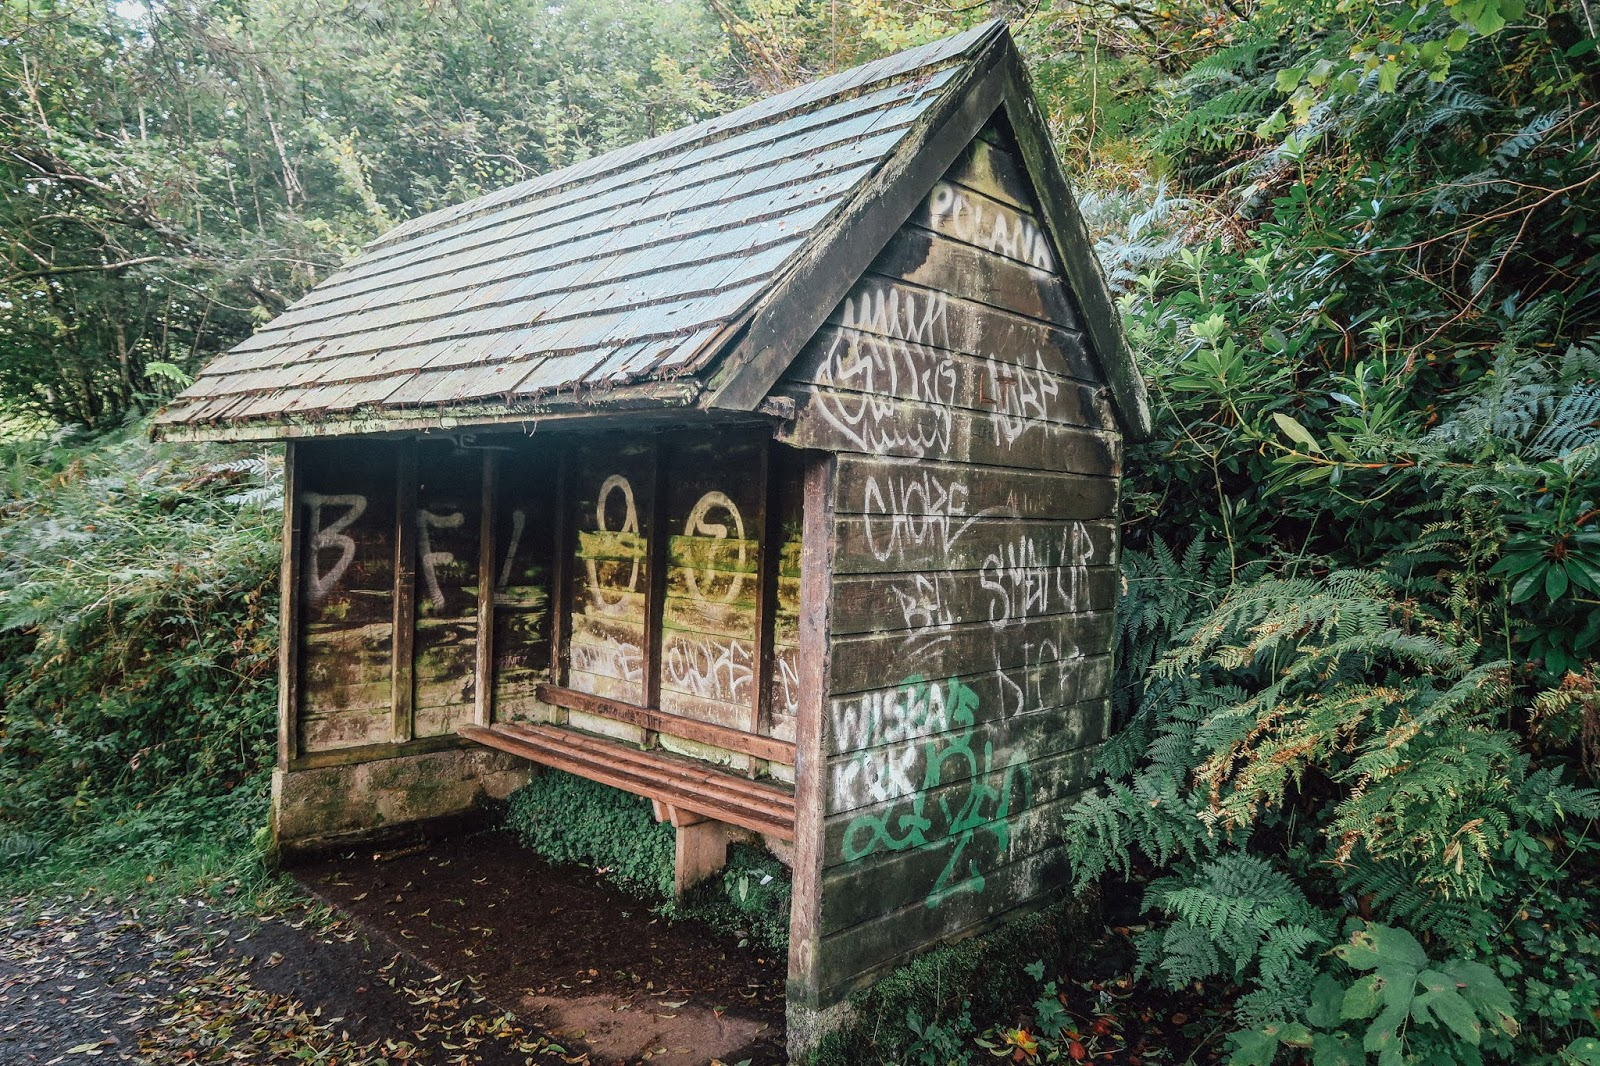 northern ireland dog walk shed graffiti liquid grain